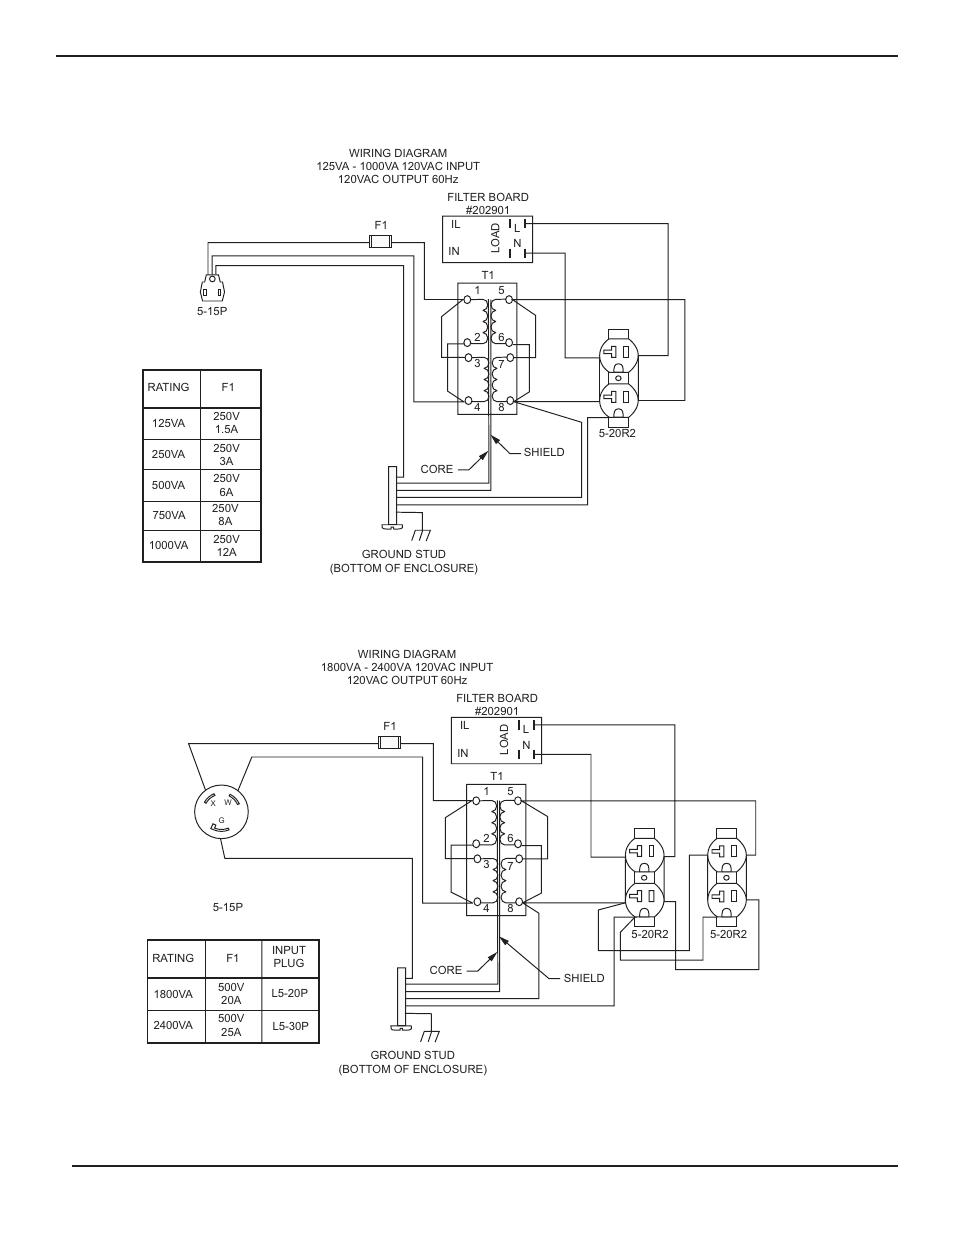 1: wiring diagram for 125va-100, 2: wiring diagram for